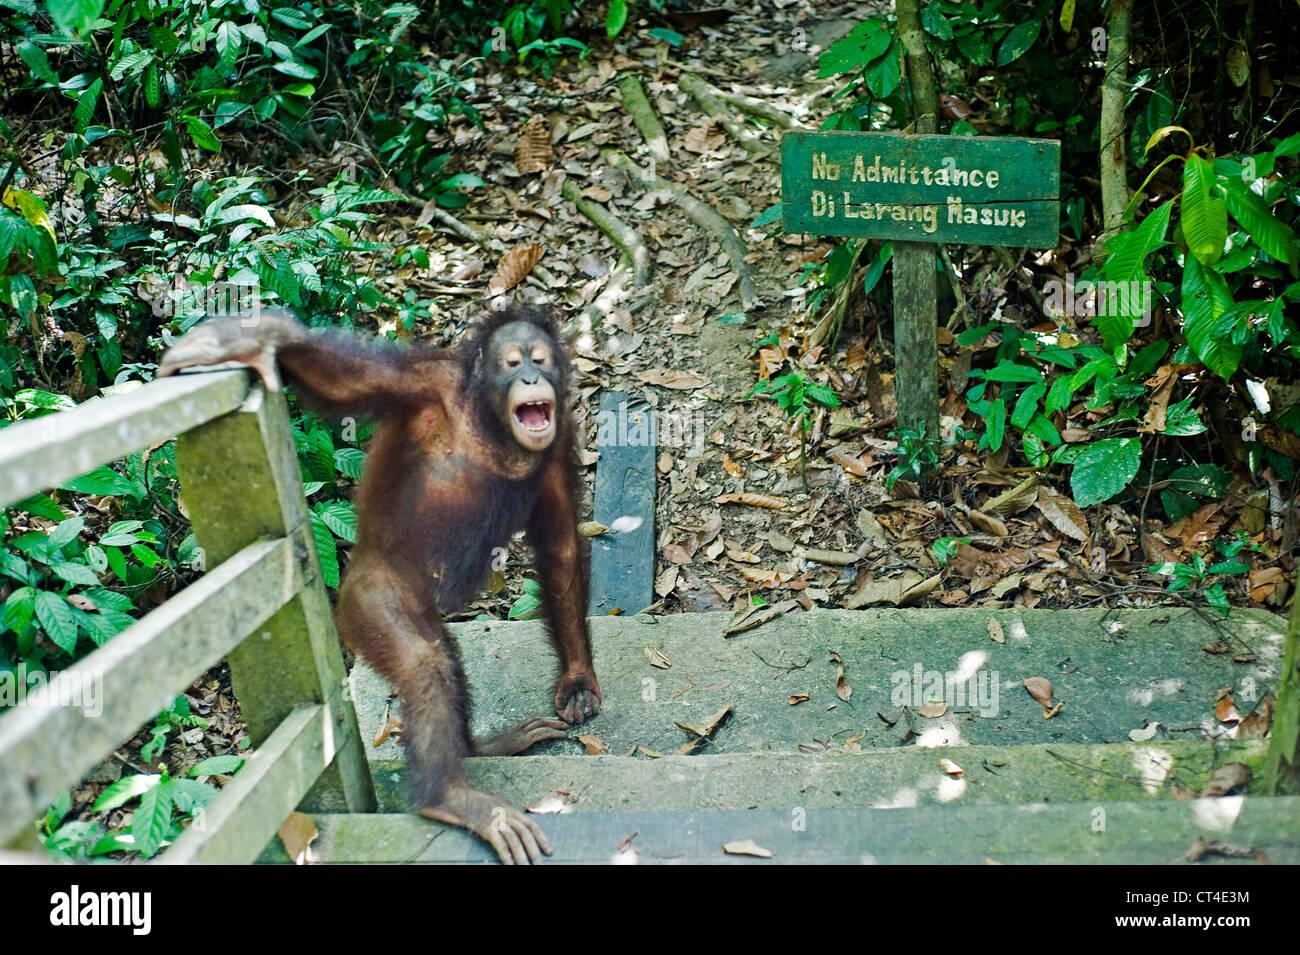 Malaysia, Borneo, Sepilok, Orangutan going through no trespasser sign - Stock Image